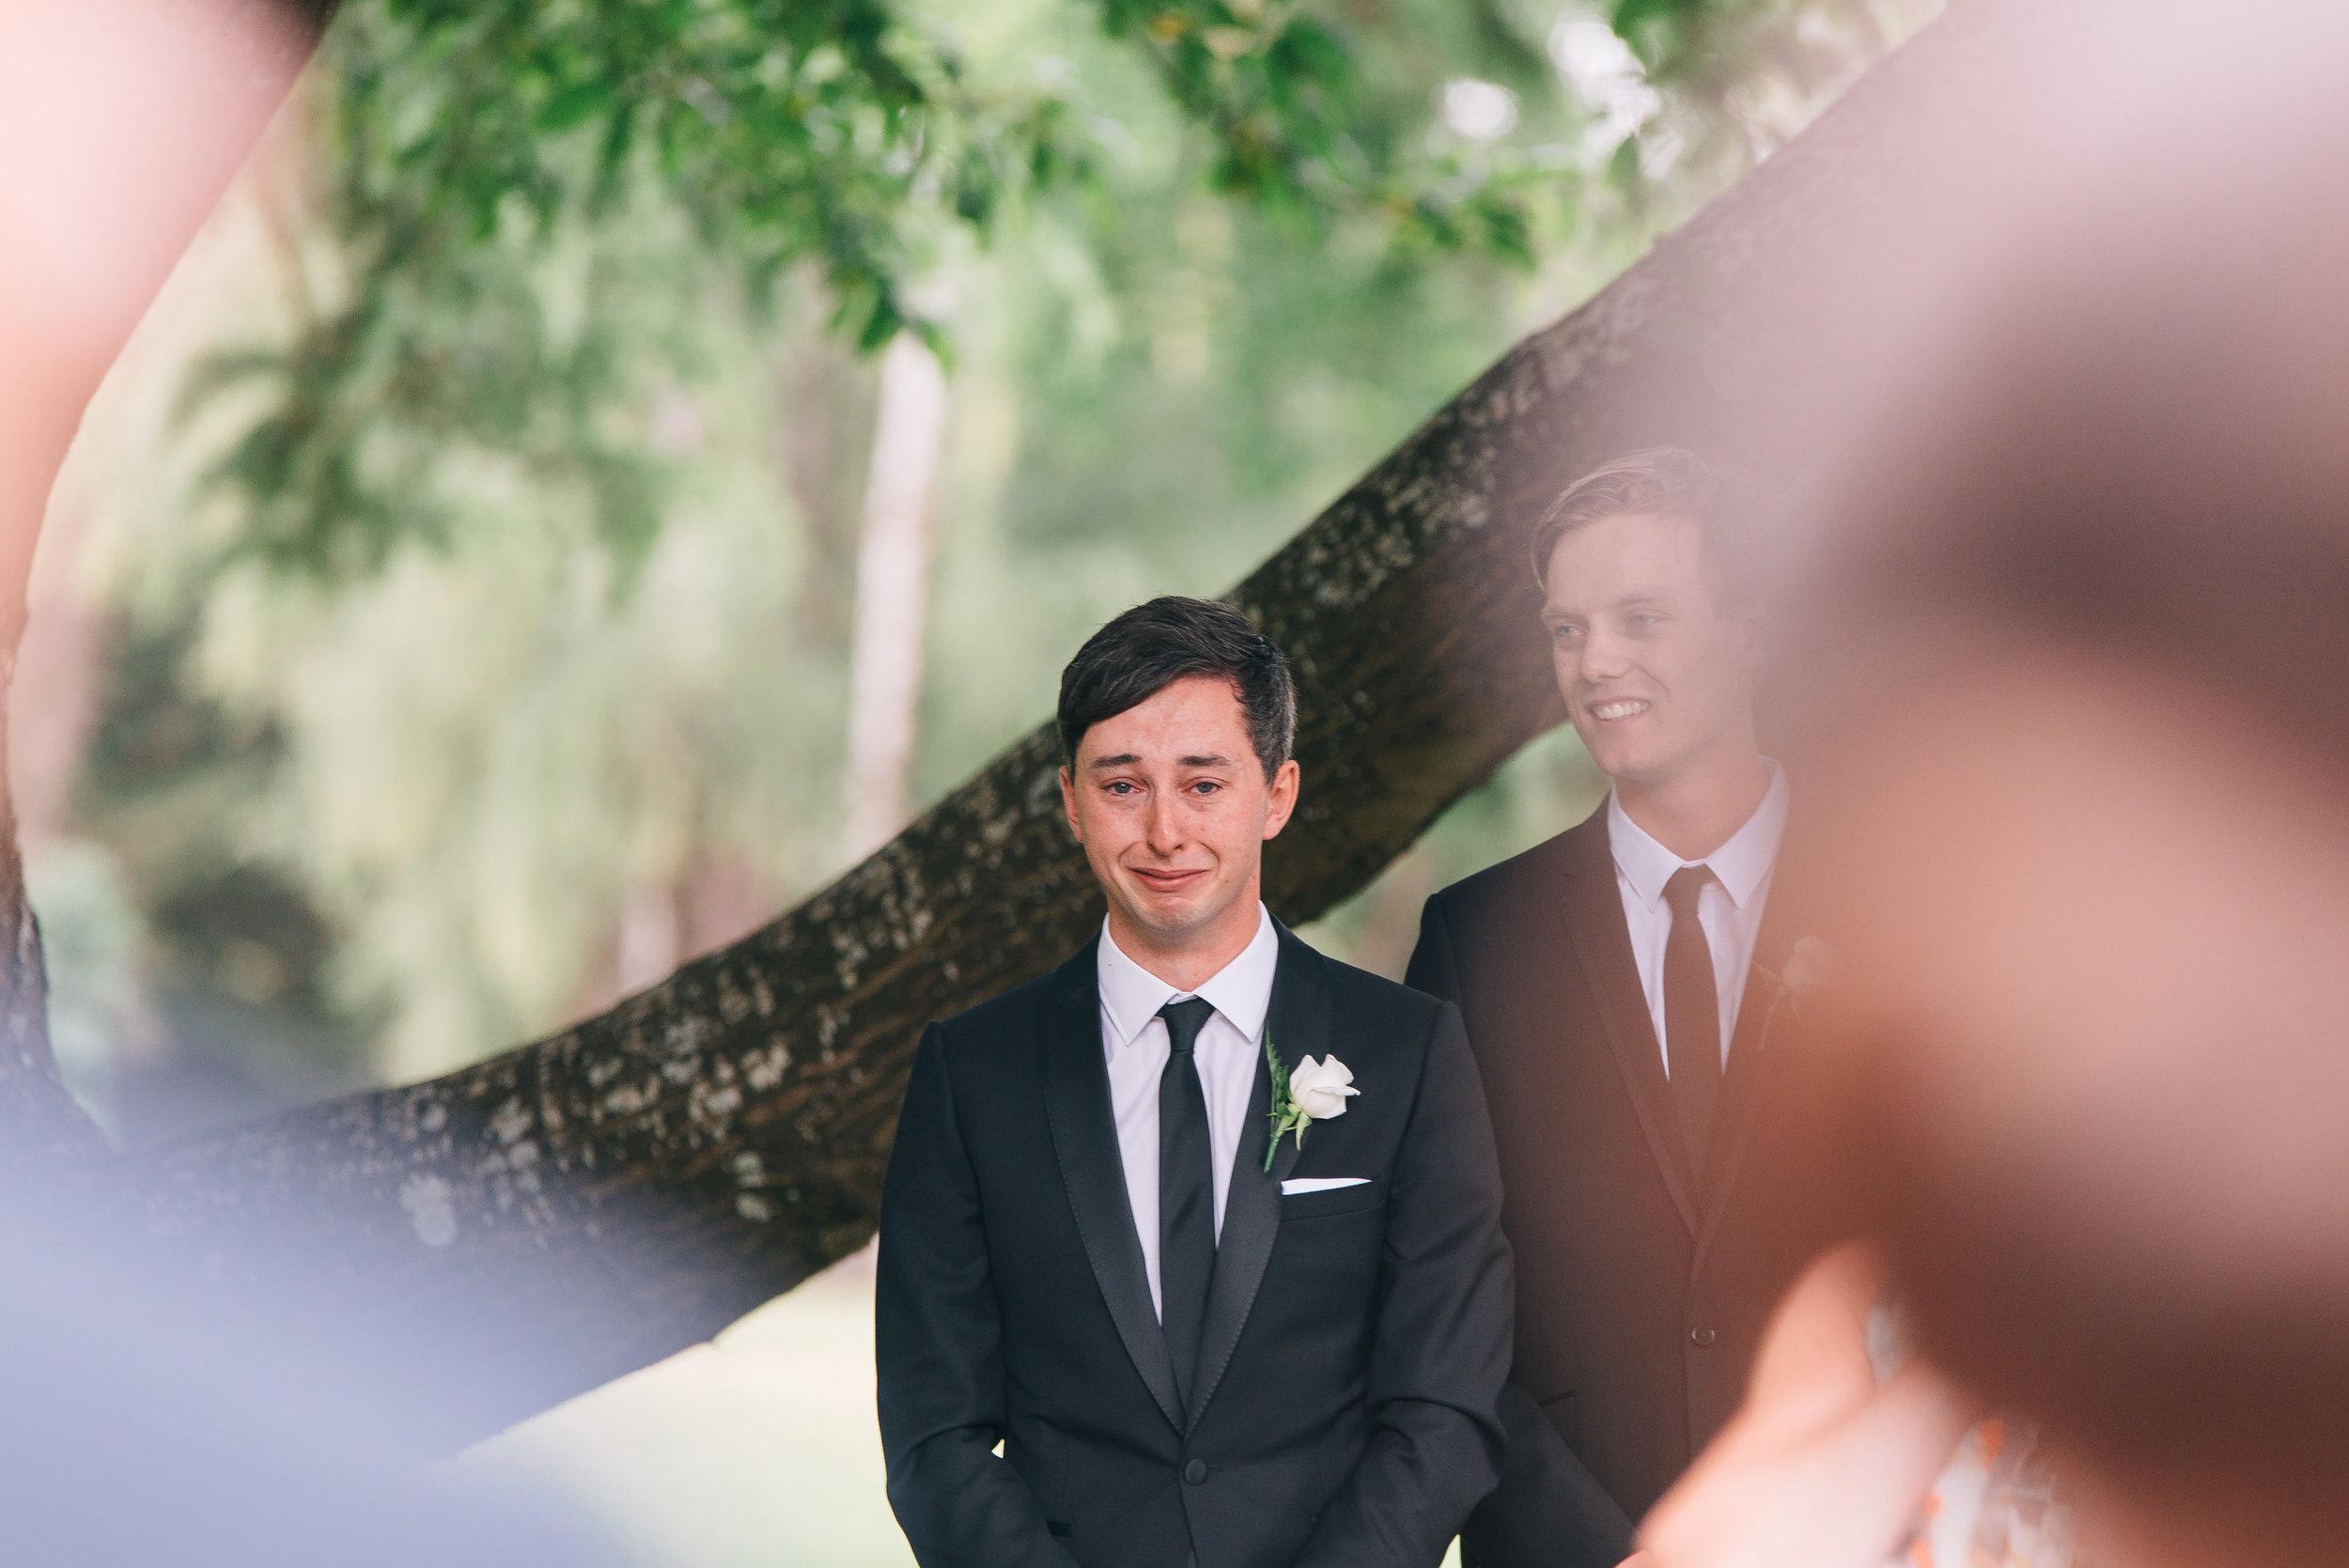 Dylan_Jenna_Wedding-20.jpg